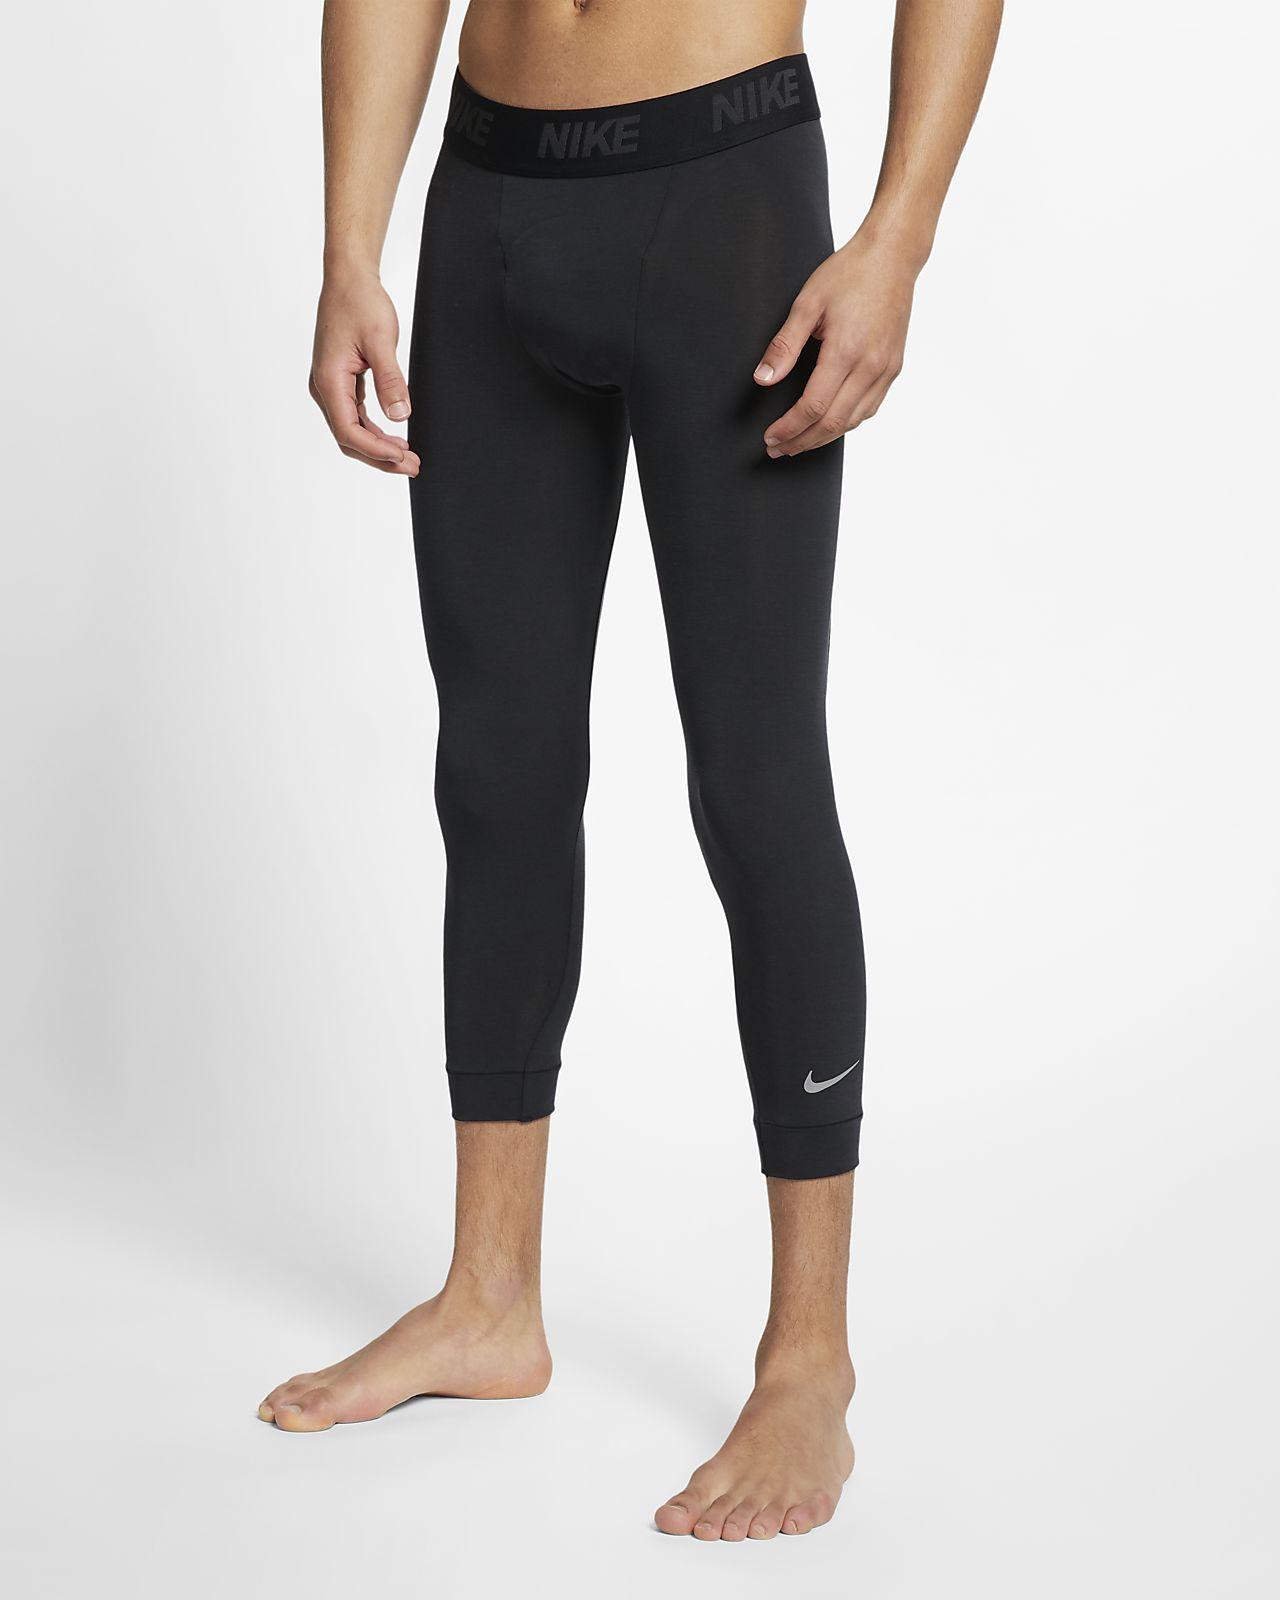 52a7c1155793a Nike Dri-FIT Men's 3/4 Yoga Training Tights. Nike.com GB